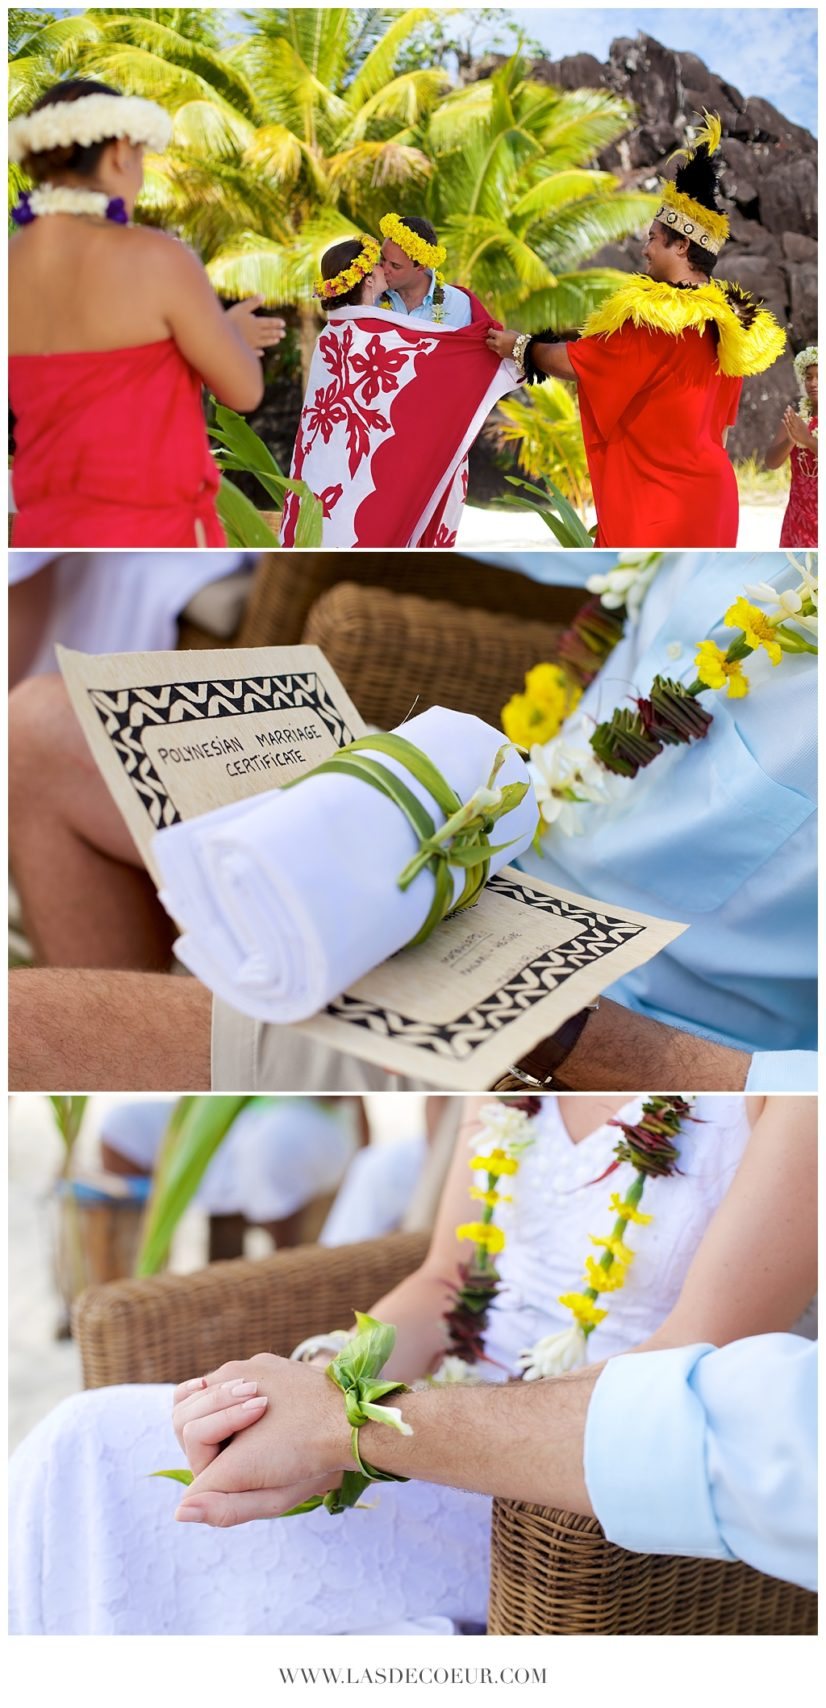 Mariage dans les iles Bora Bora Tahiti cérémonie polynesienne ©lasdecoeur